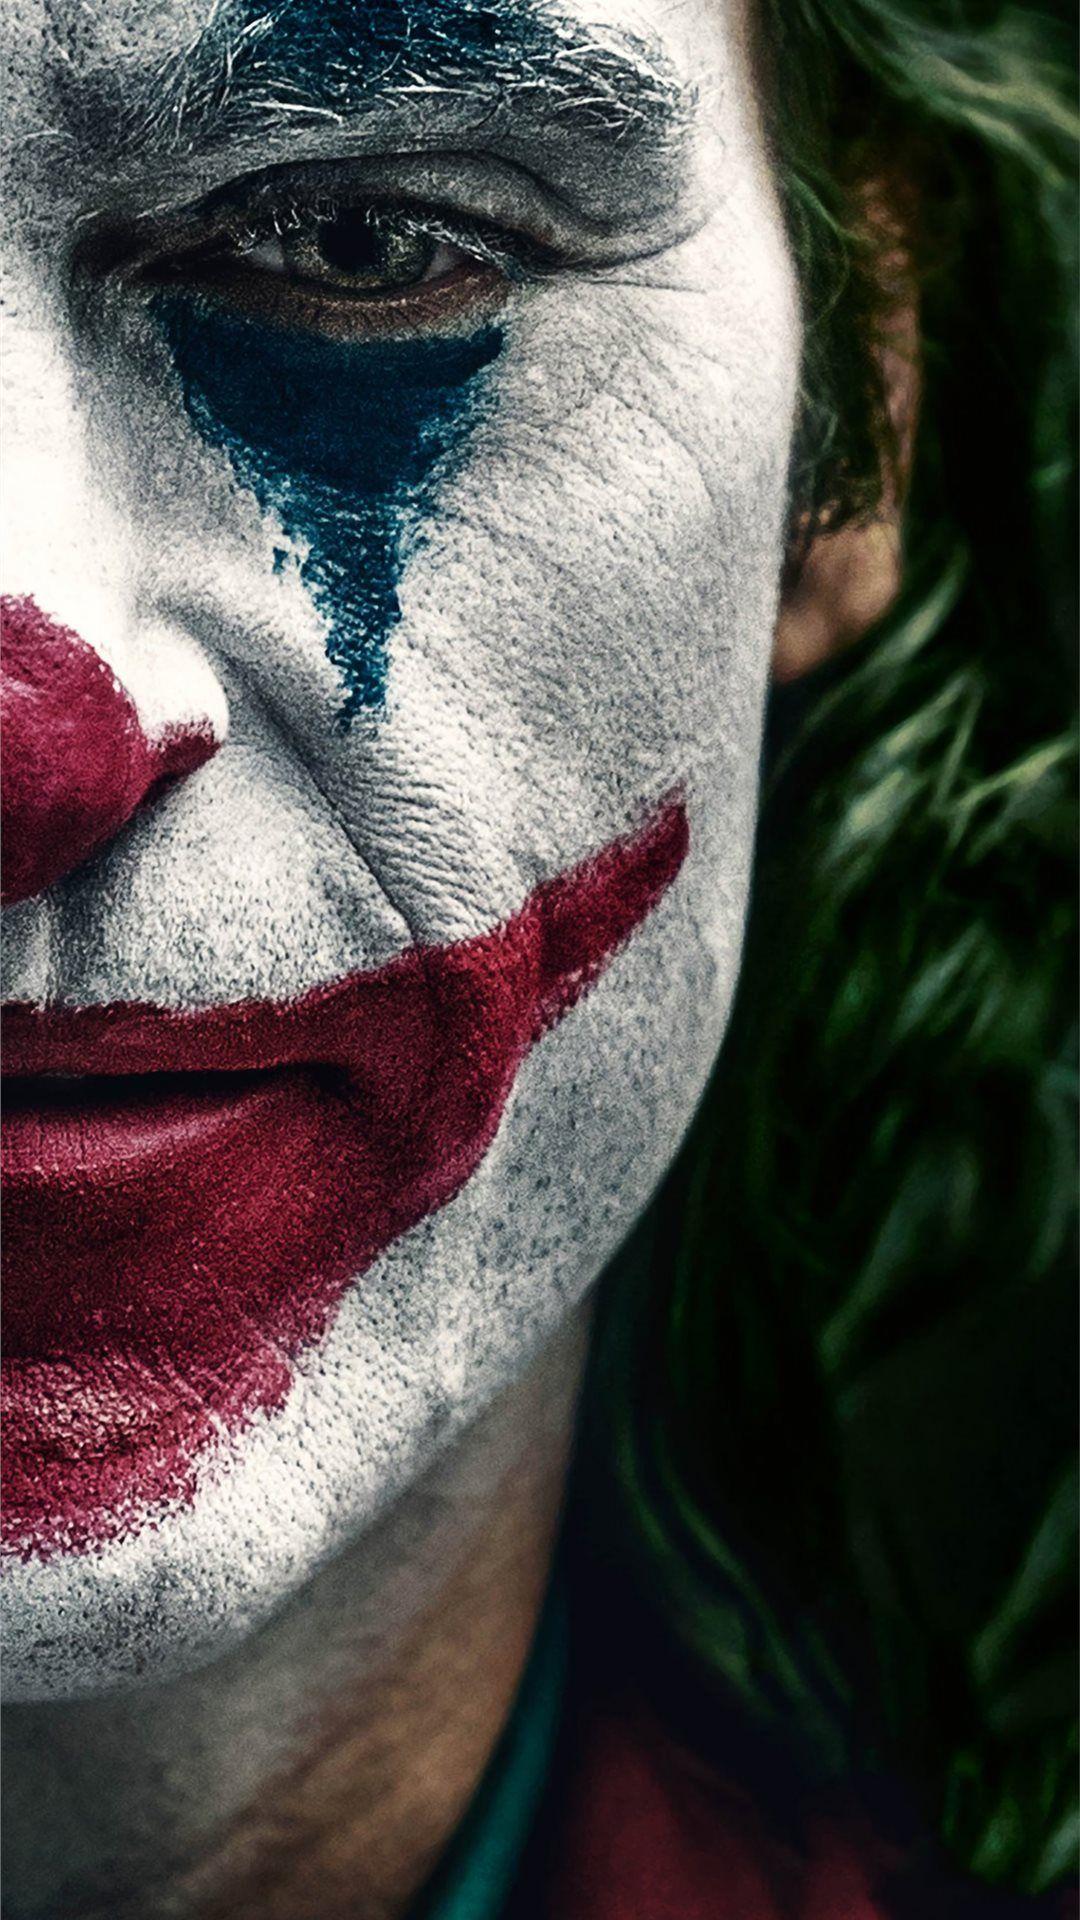 Joker 2019 Movie Iphone 8 Wallpapers Joker Poster Joker Wallpapers